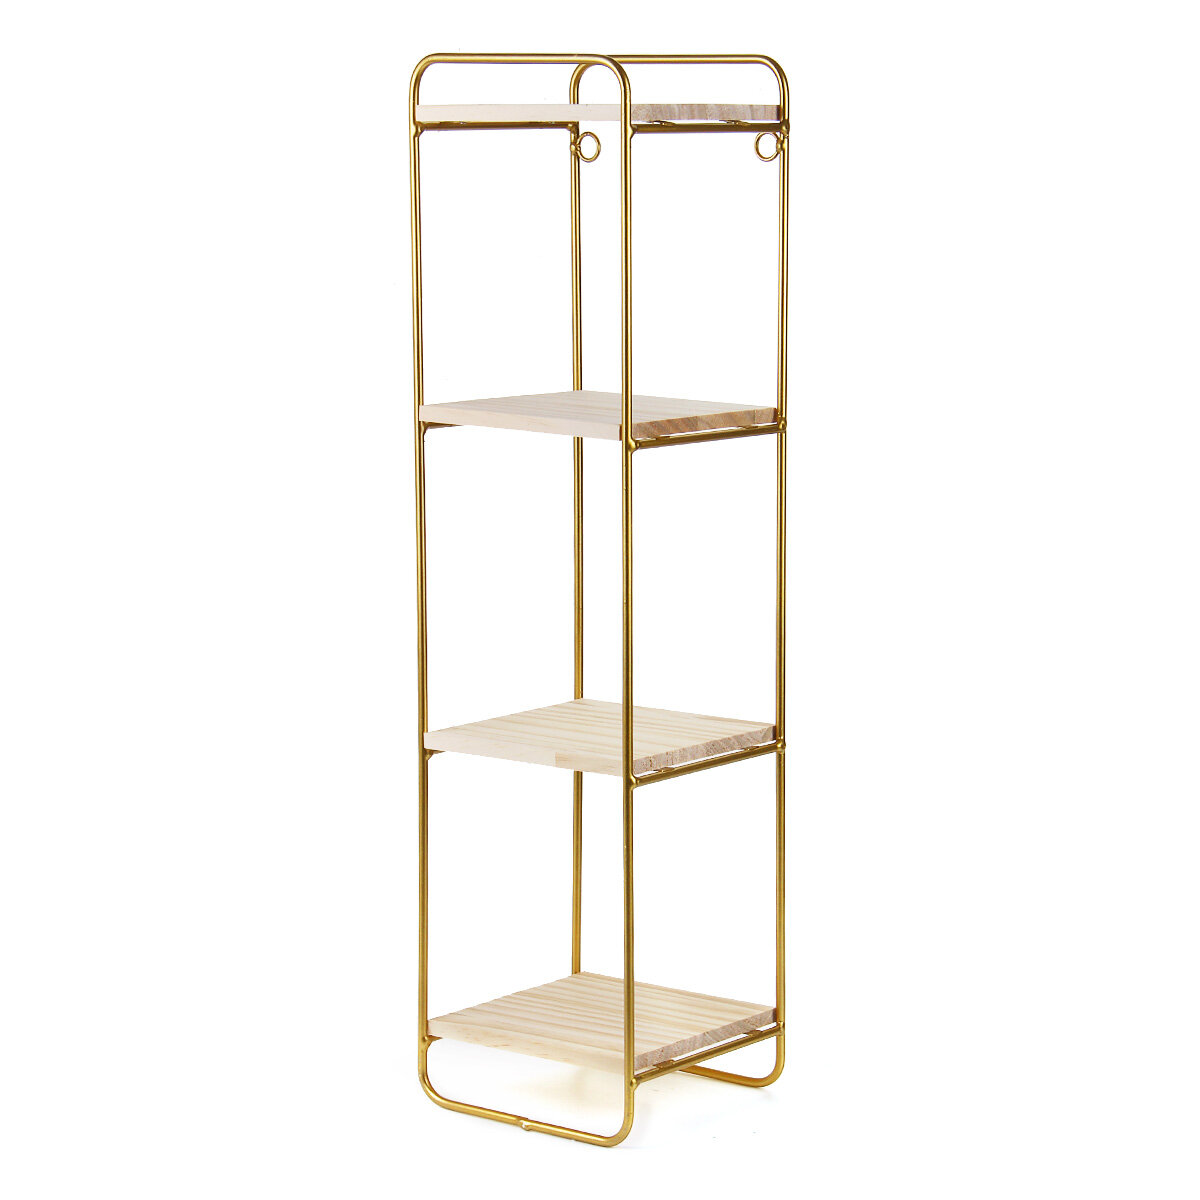 4 Tiers Wall Storage Shelves Metal Wood Modern Bookshelf Storage Rack Desktop Orangizer